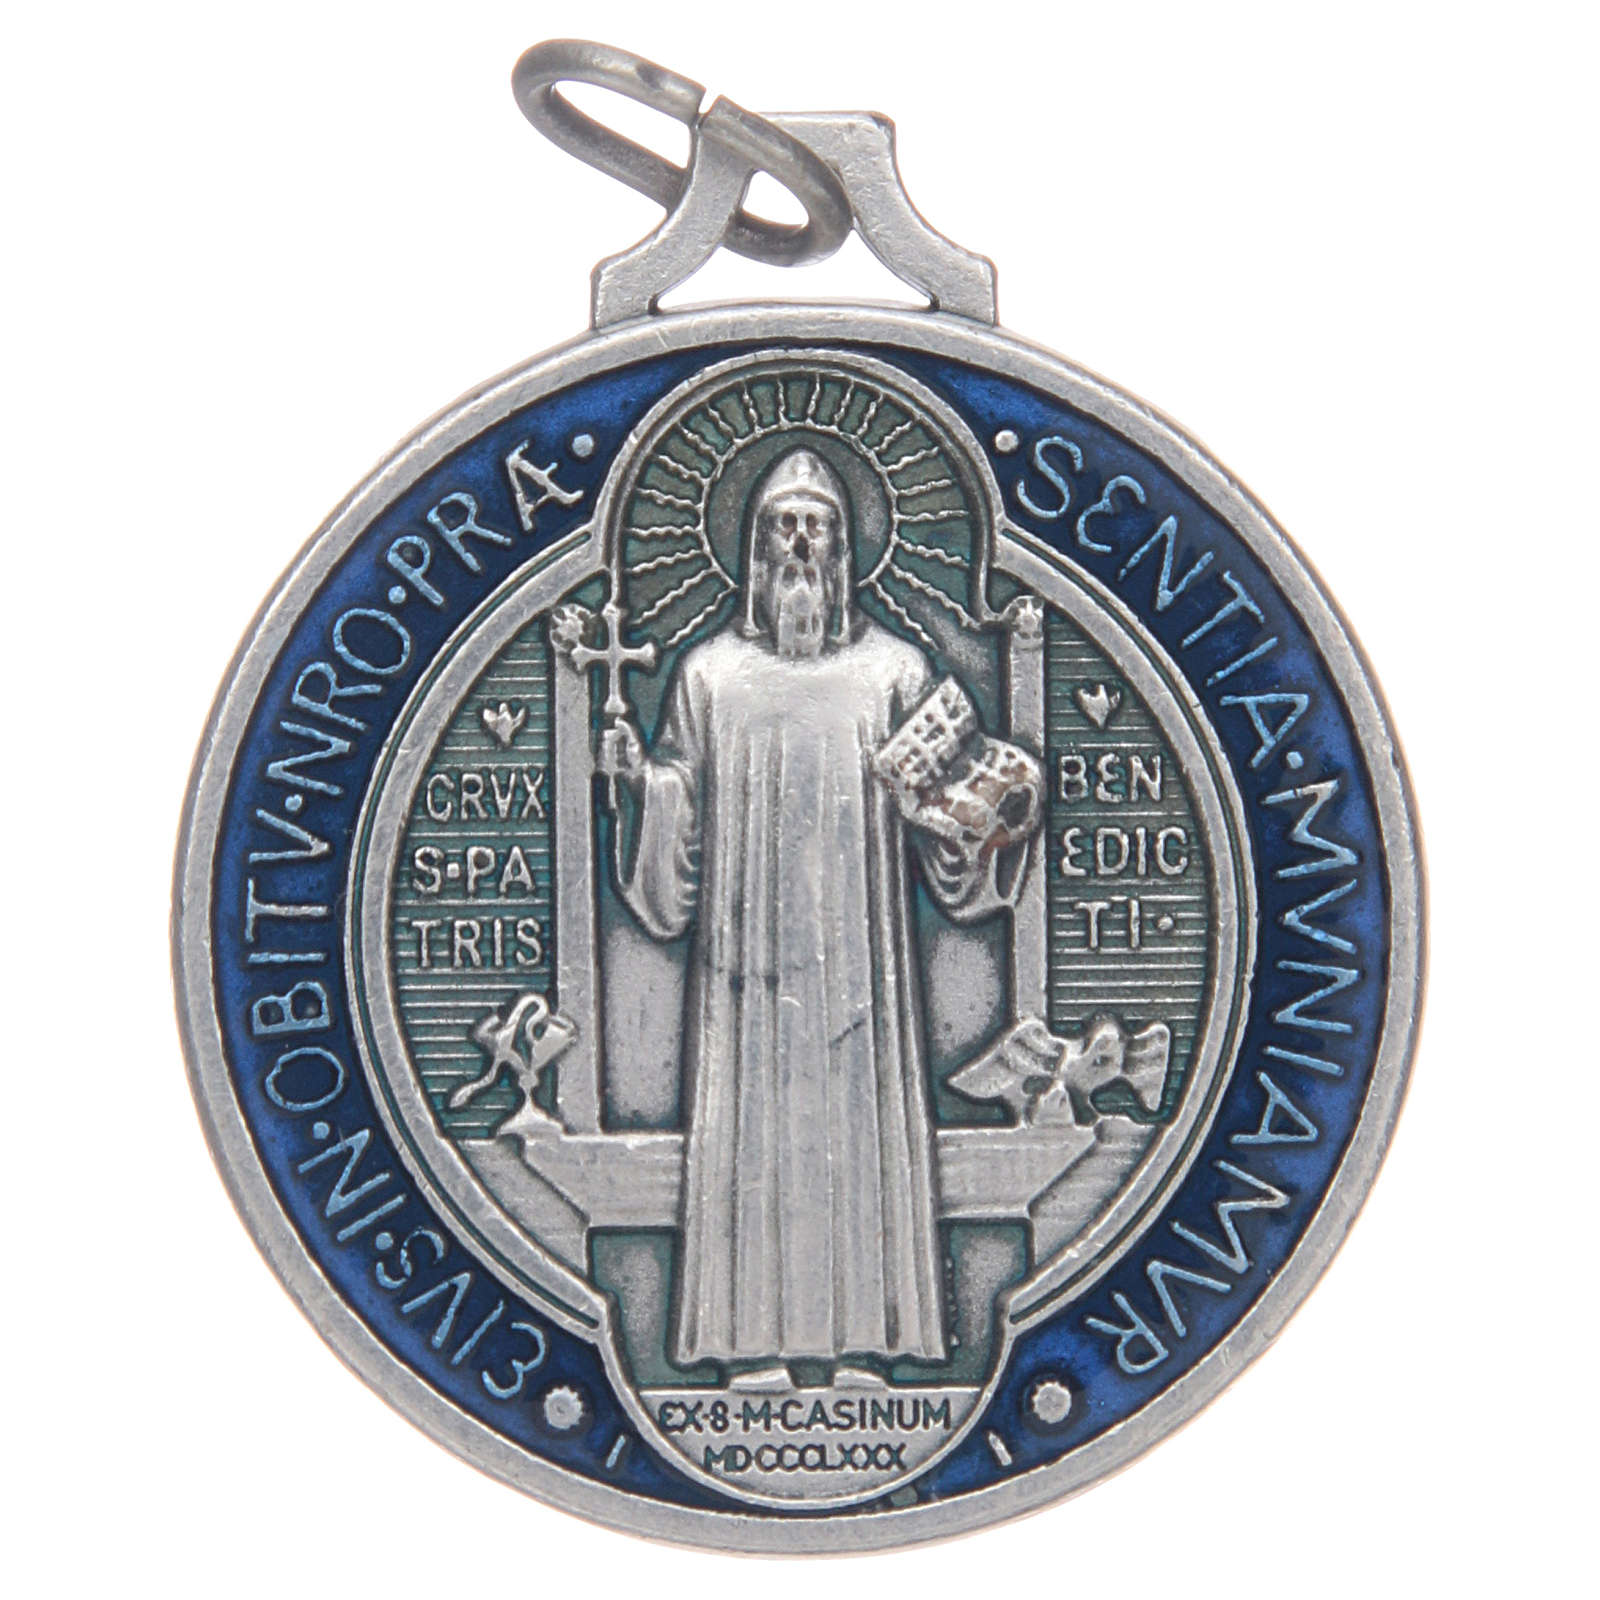 Medaille Heiliger Benedikt Zamak versilbert emailliert verschiedene Maße 4